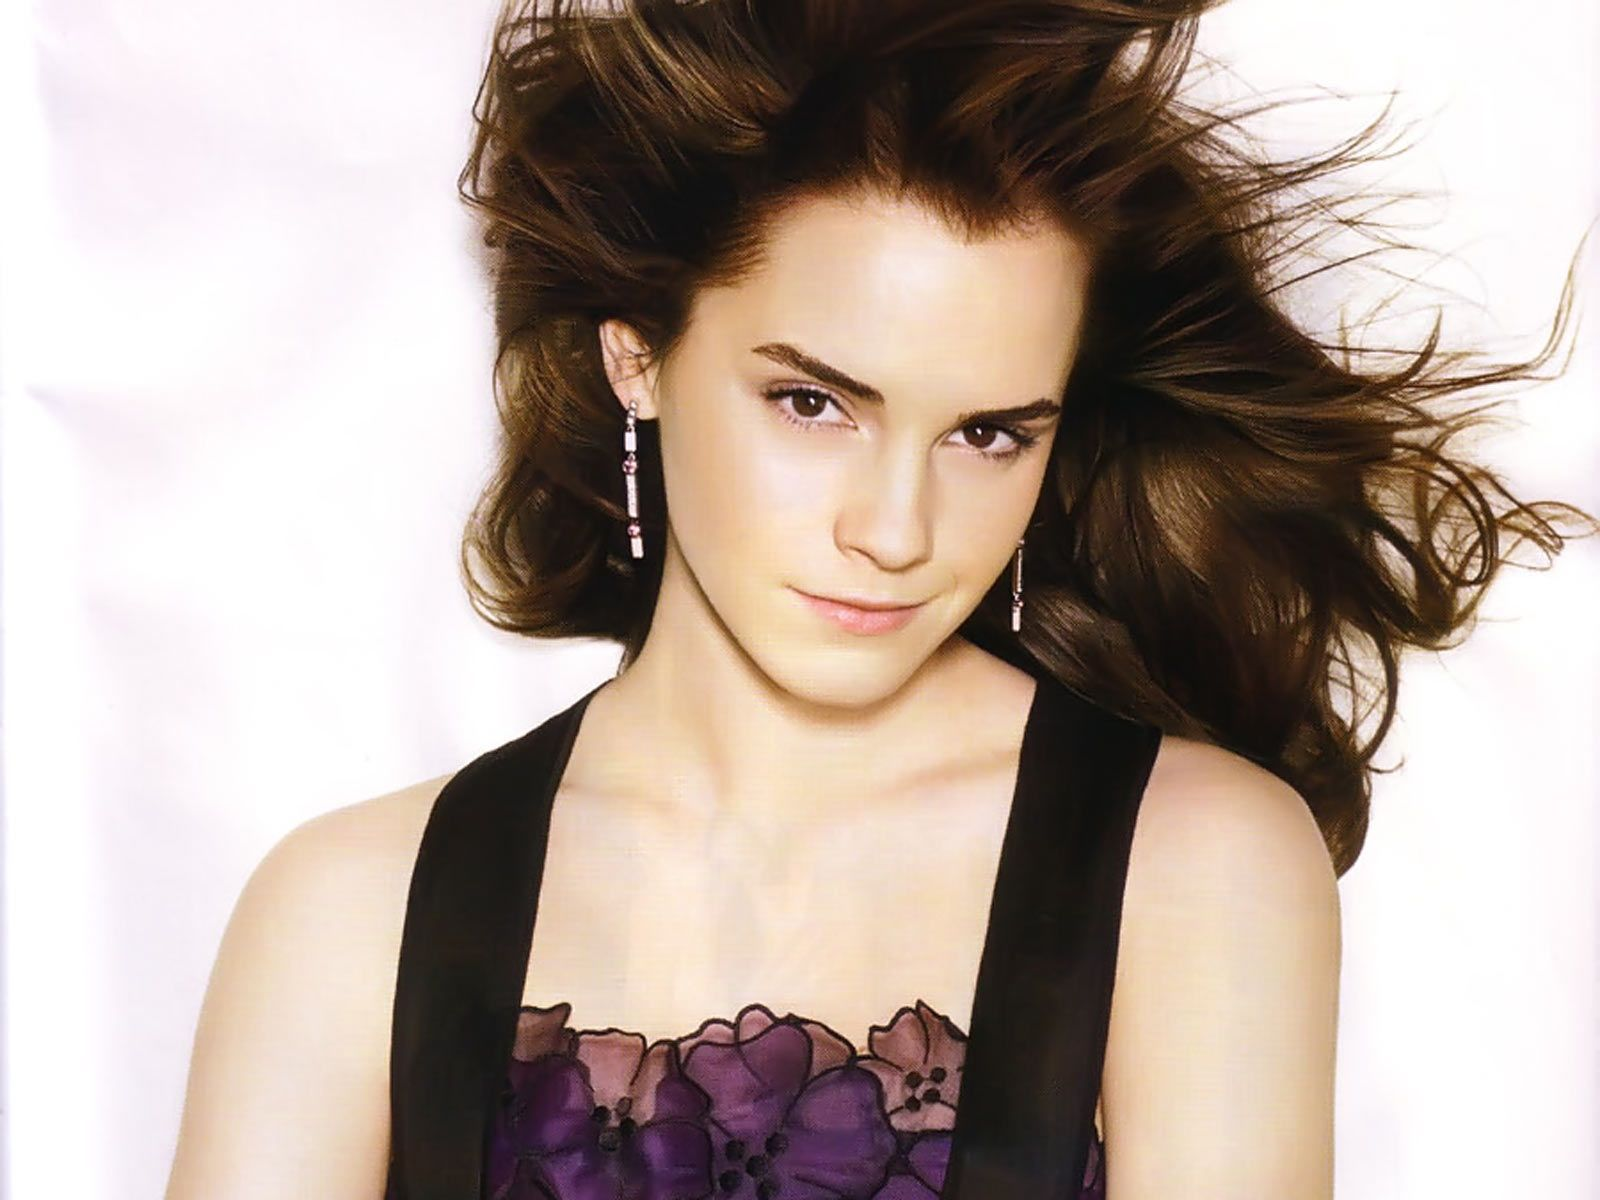 Emma Watson Beautiful x All For Desktop 3D Wallpapers